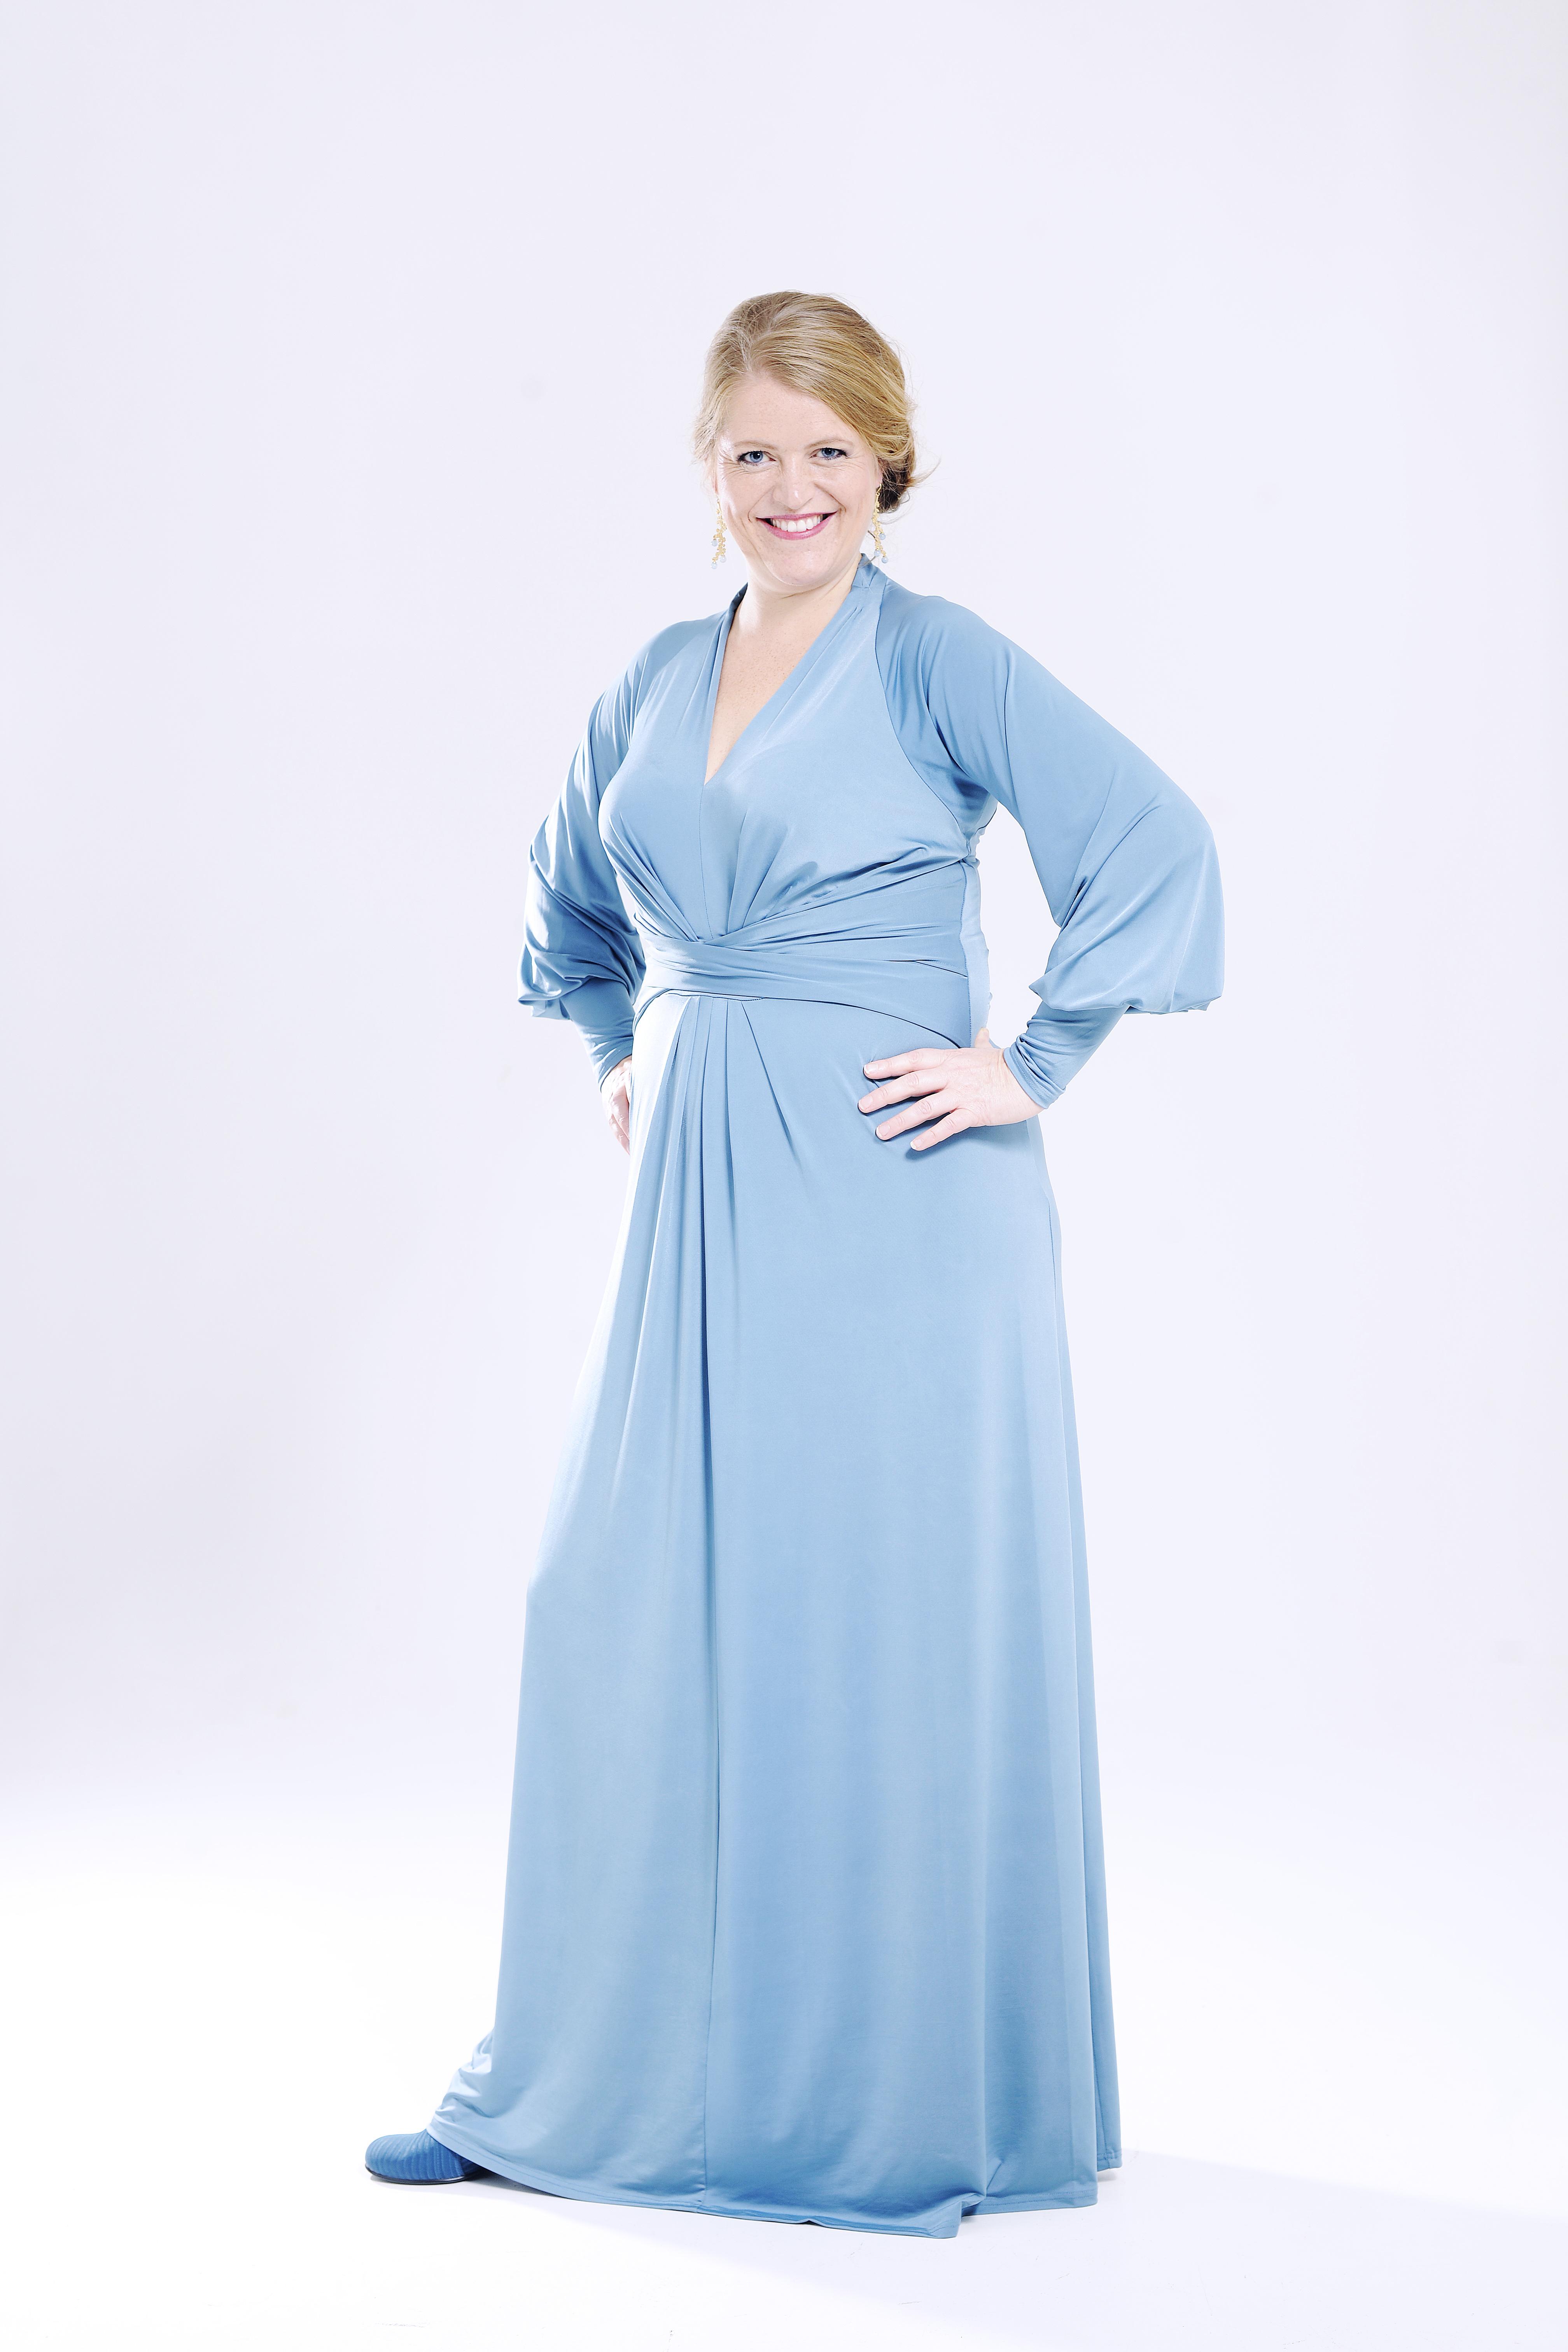 Elin Aase helfigur blå kjole.jpg